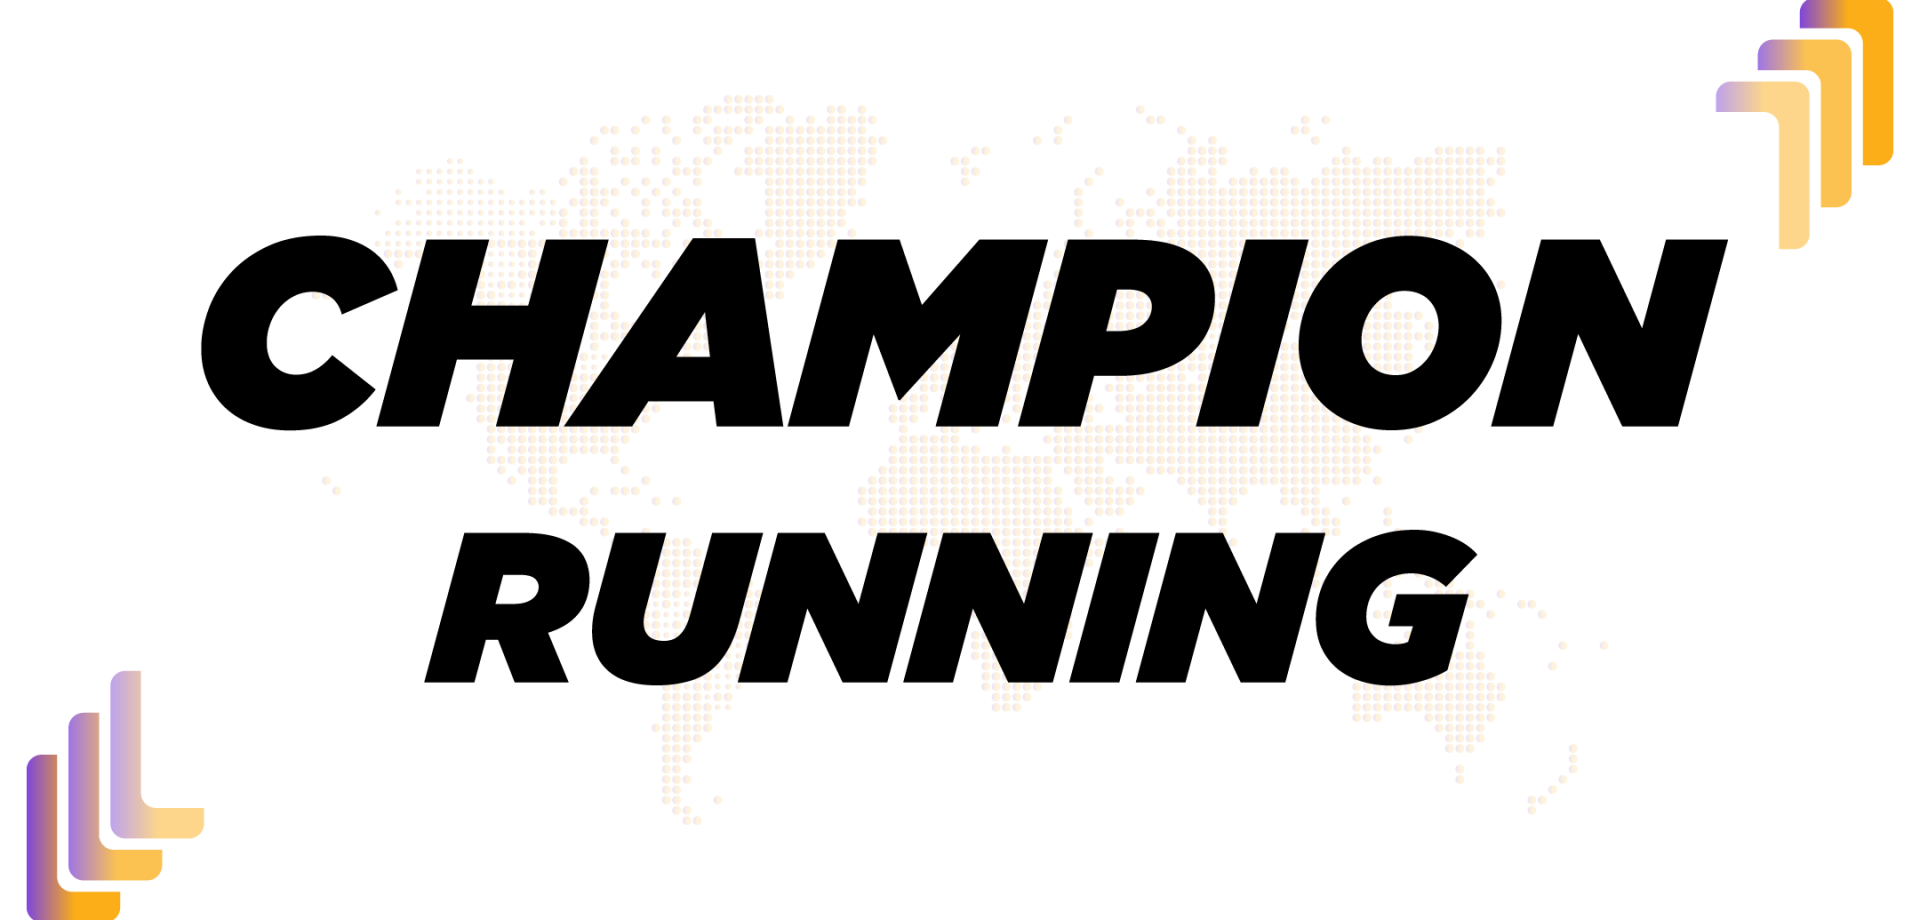 Champion Running image